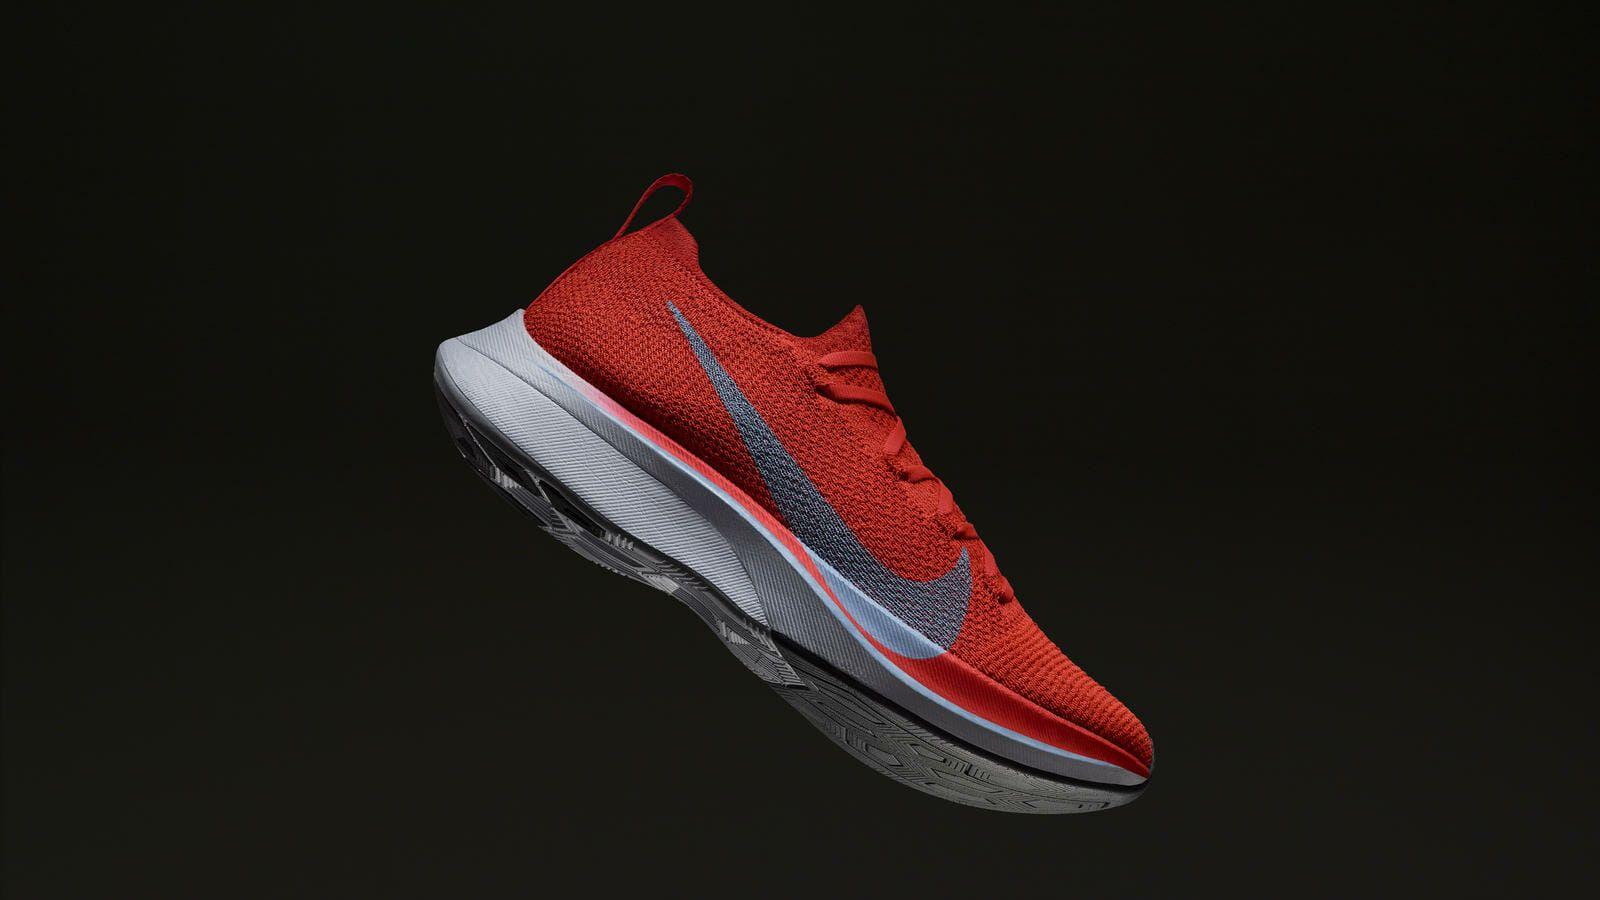 ShoesRunning Marathon To Nike Their Improve Aims Fastest lFKcTJ13